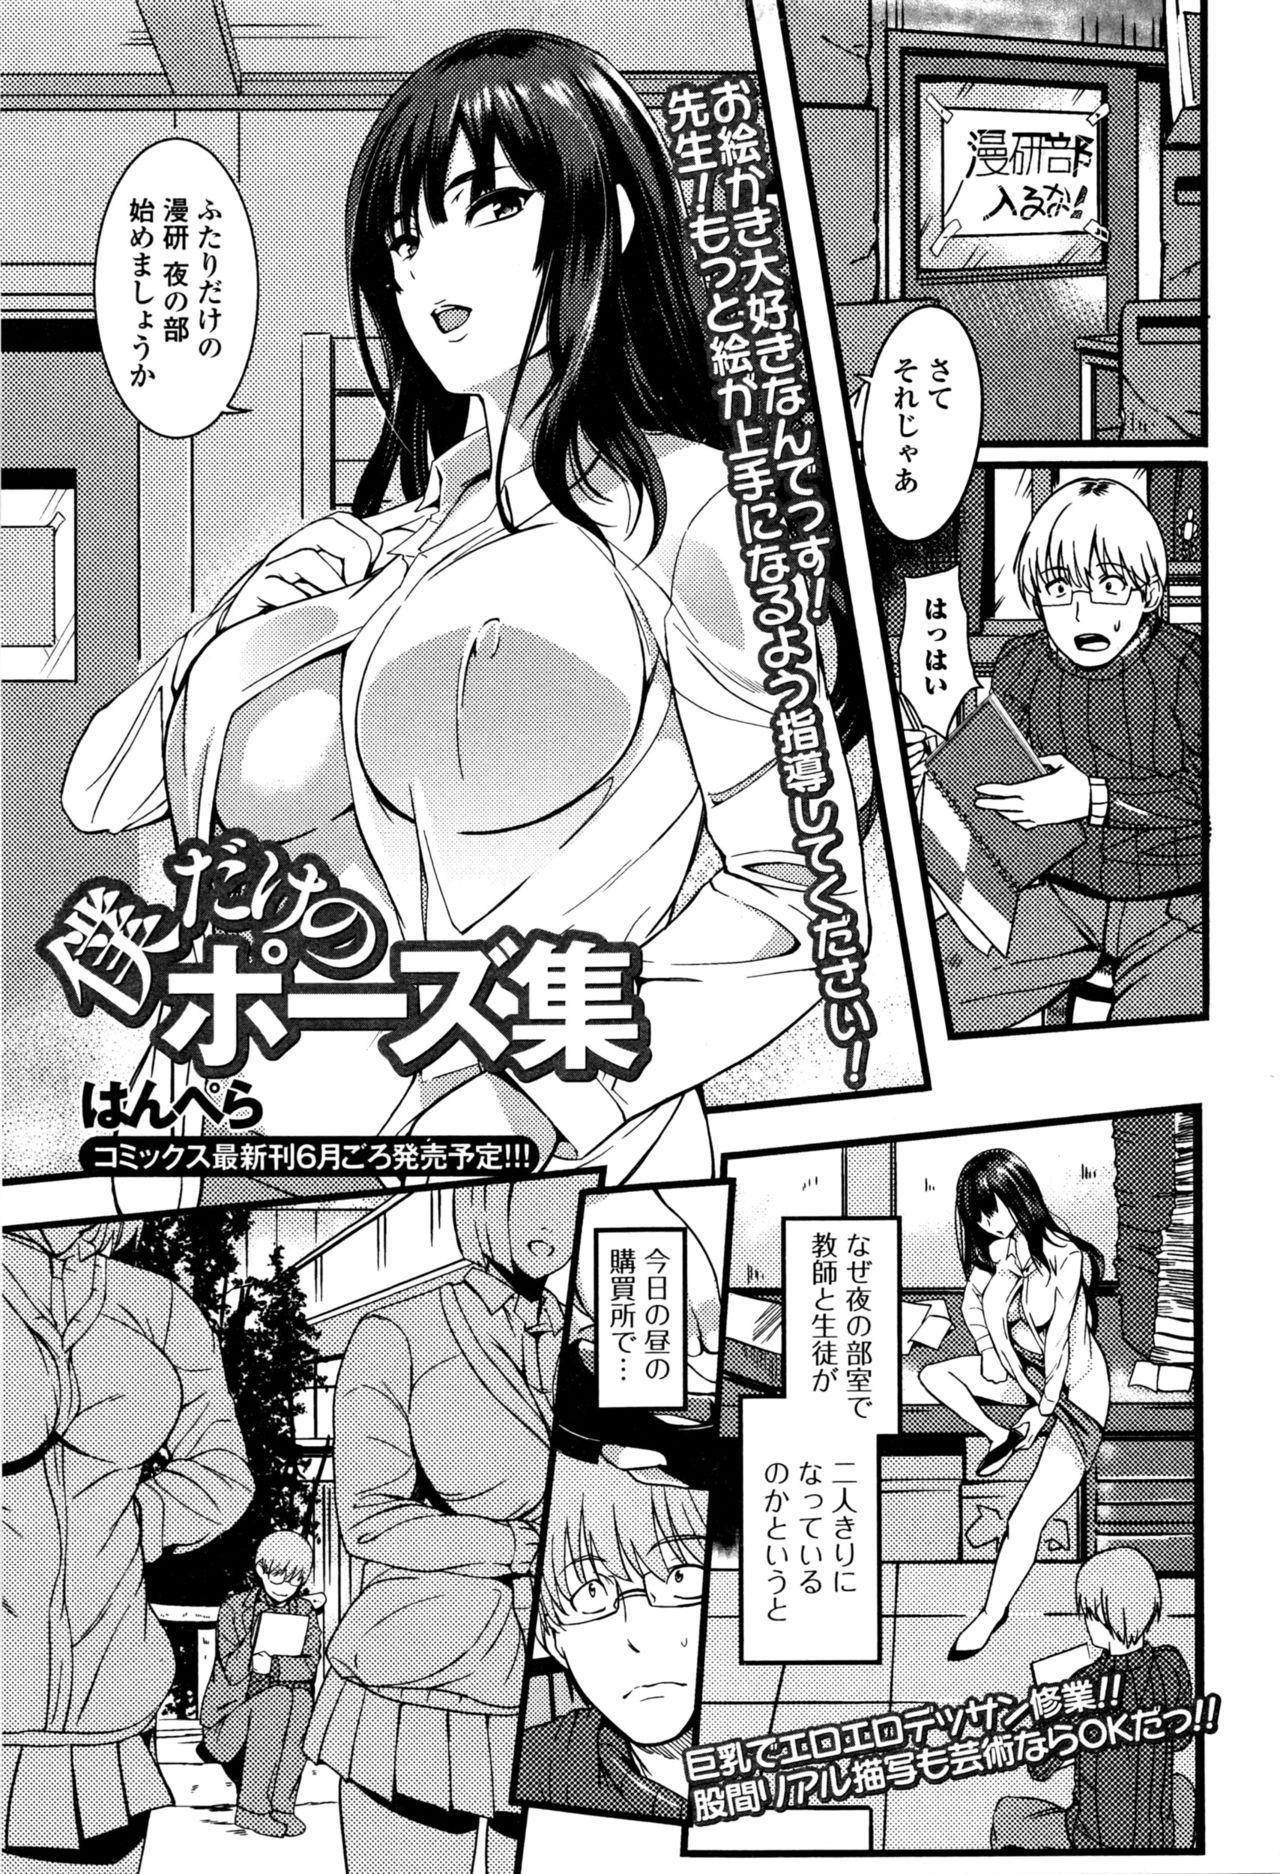 Comic JSCK Vol.4 2016-05 93